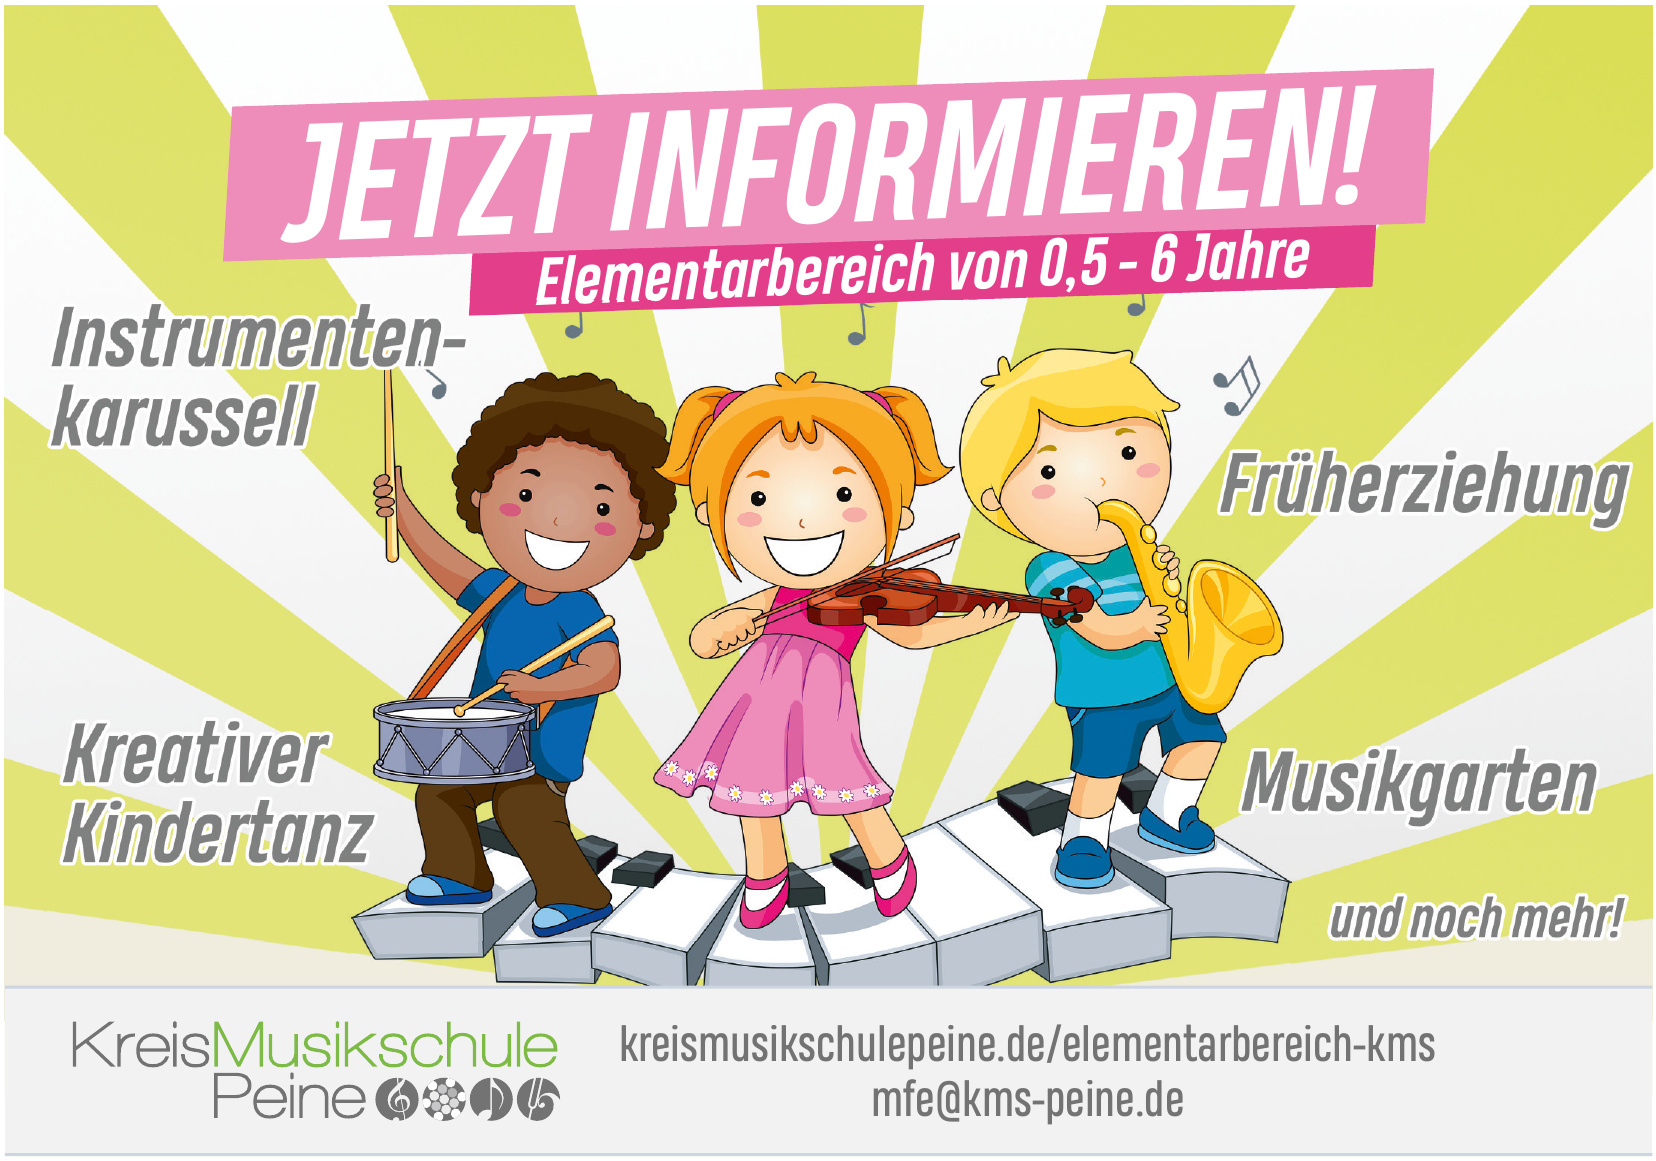 KreisMusikschule Peine